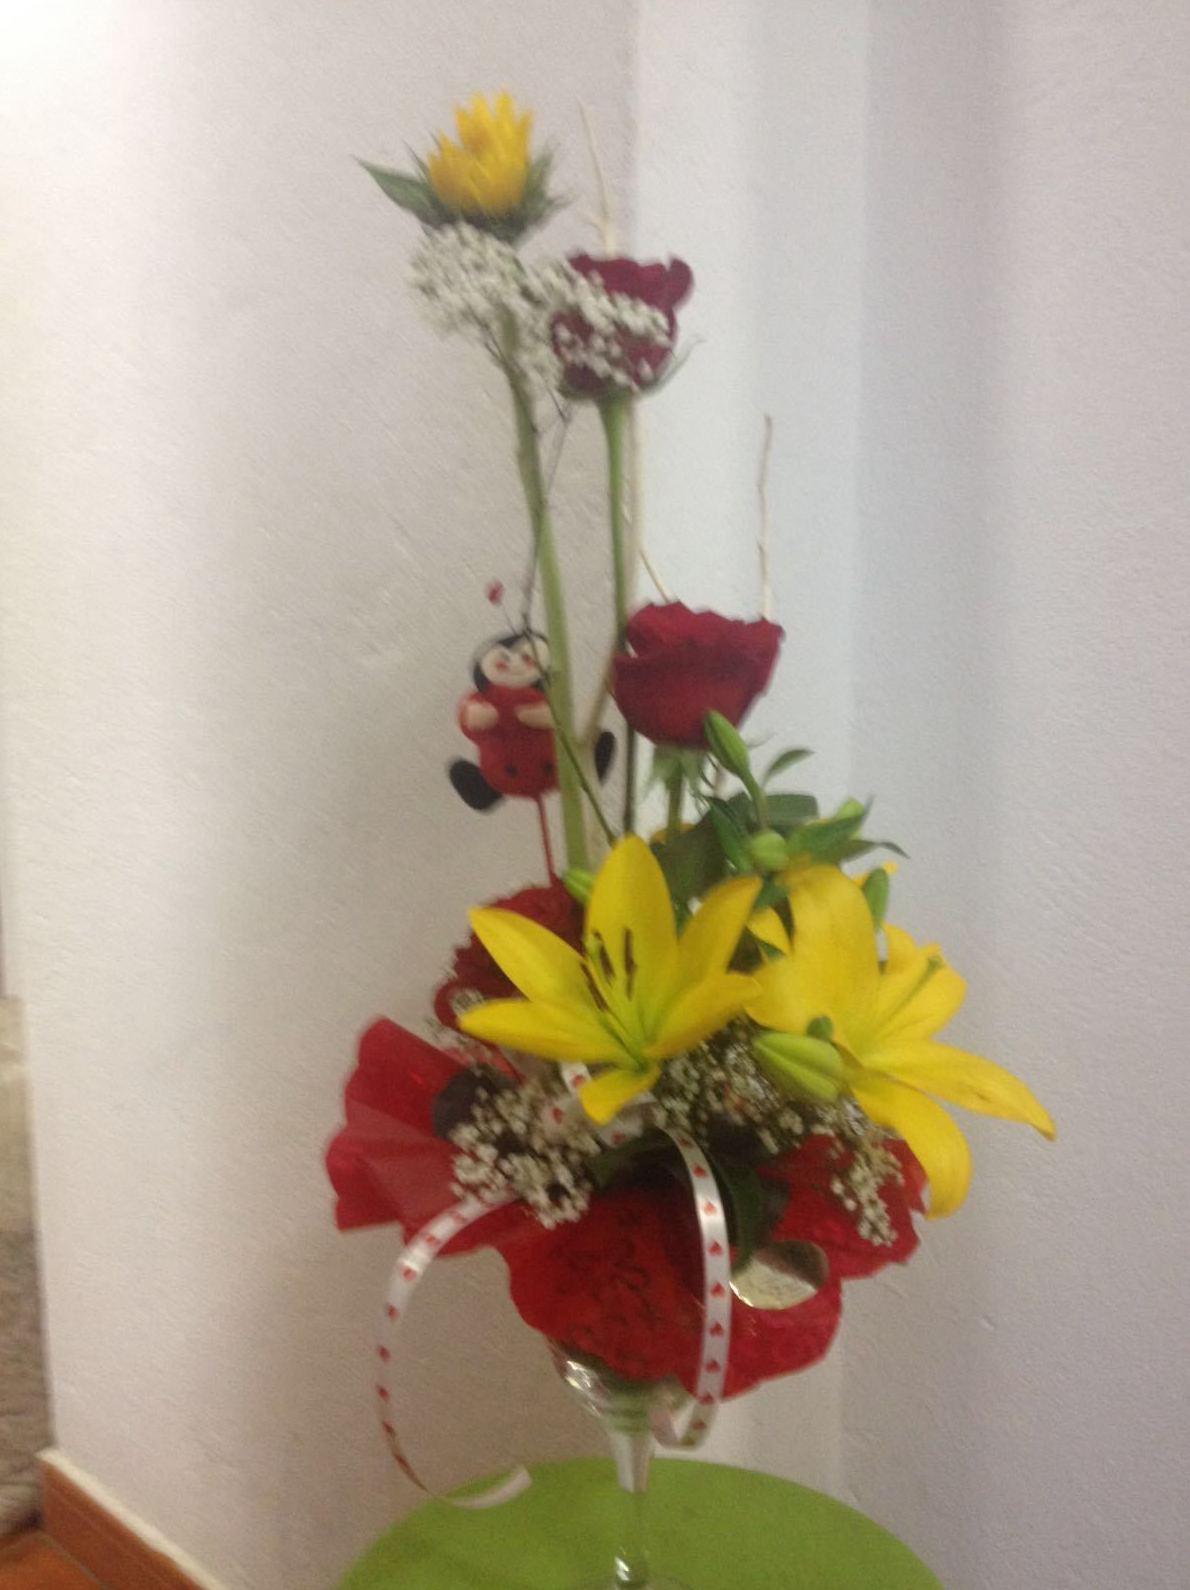 Decoración floral para eventos: Servicios  de Floristería Tías